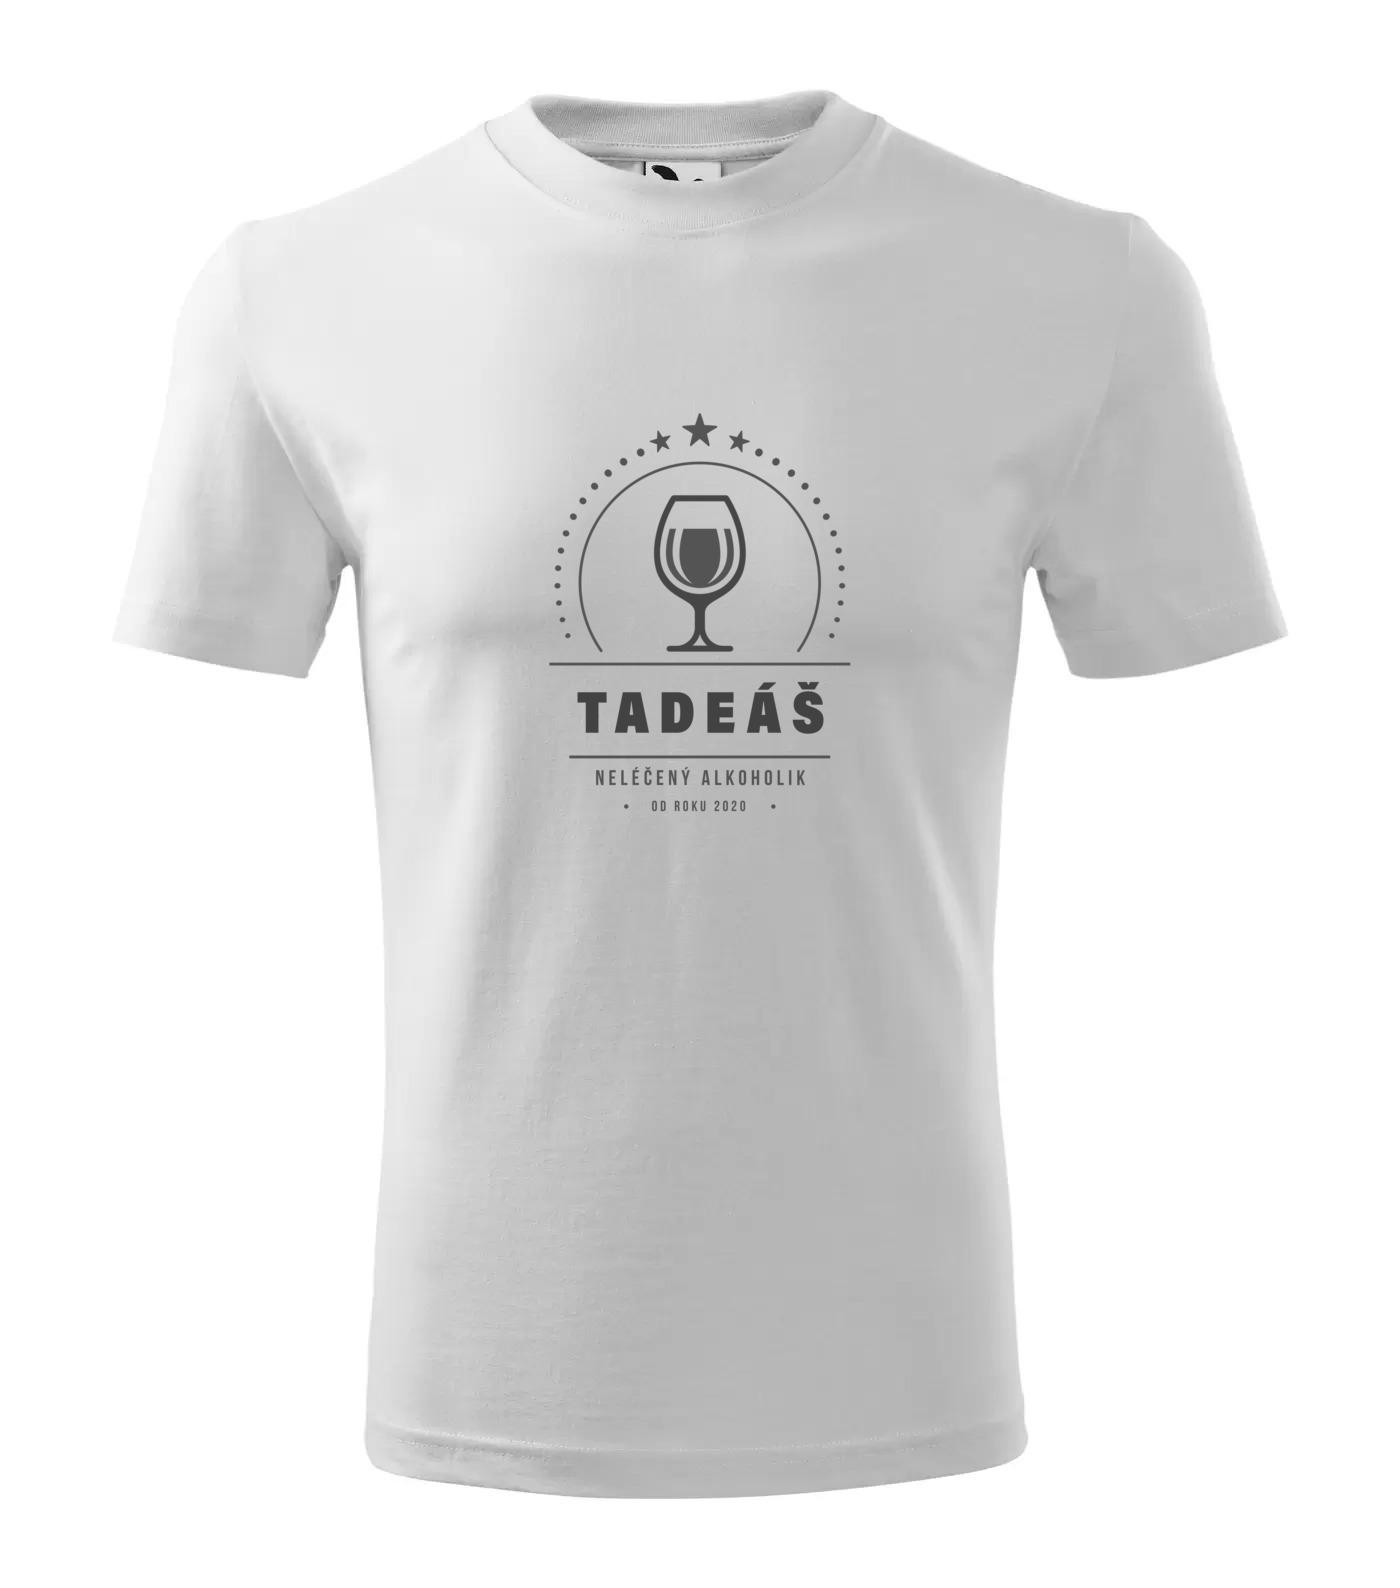 Tričko Alkoholik Tadeáš